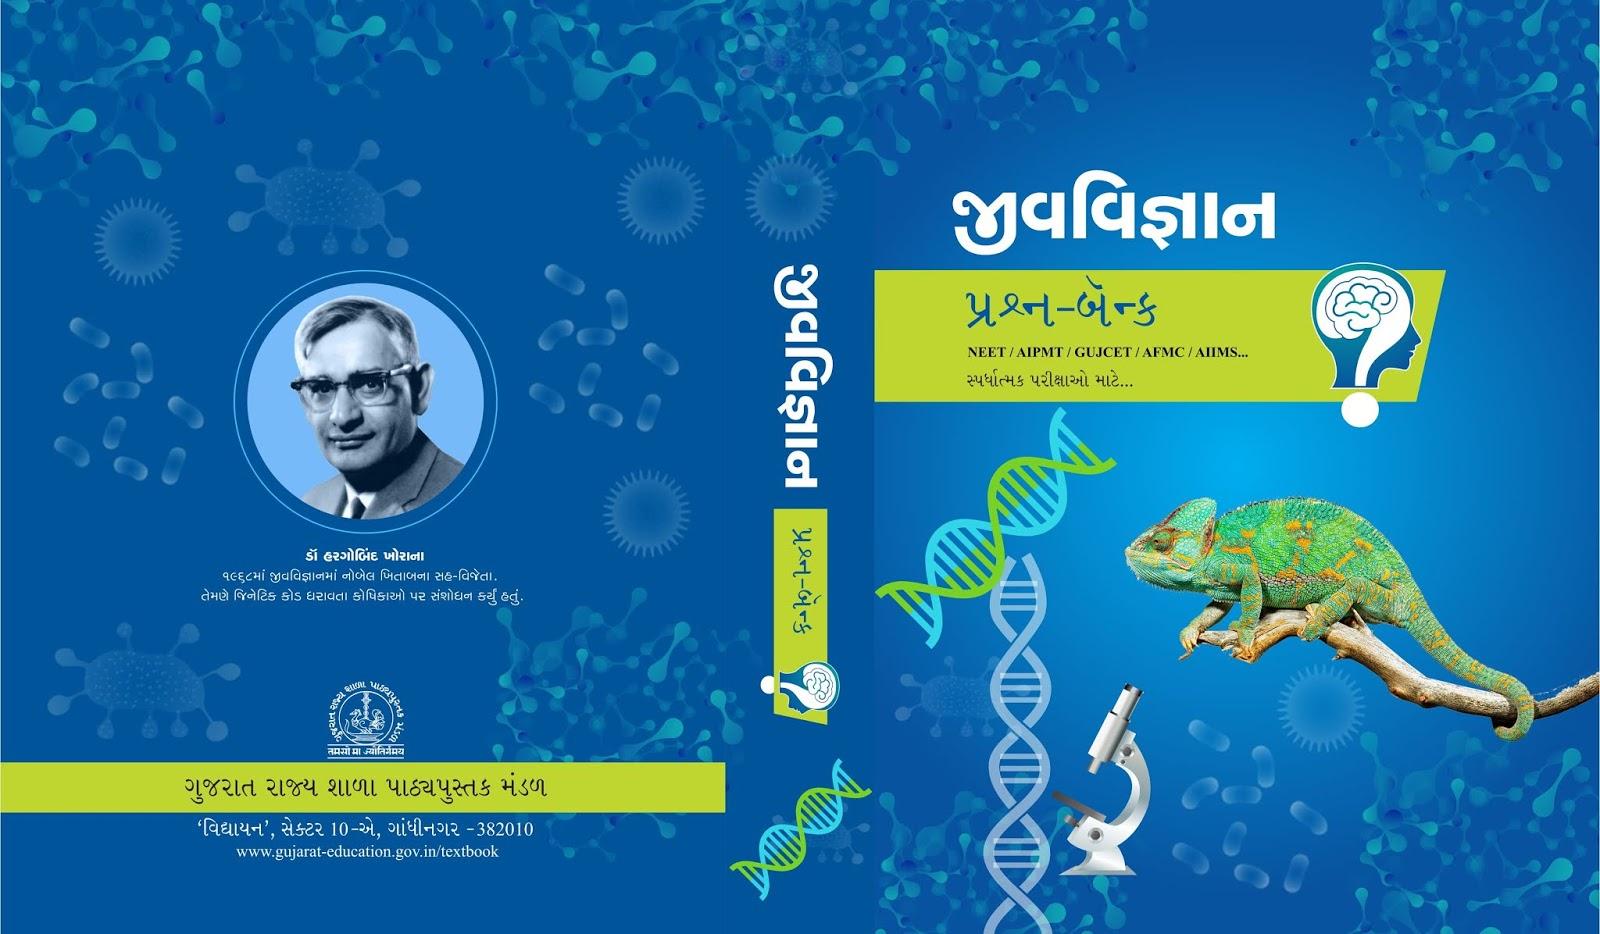 Standard - 11 & 12 Science Biology Question Bank (Gujarati